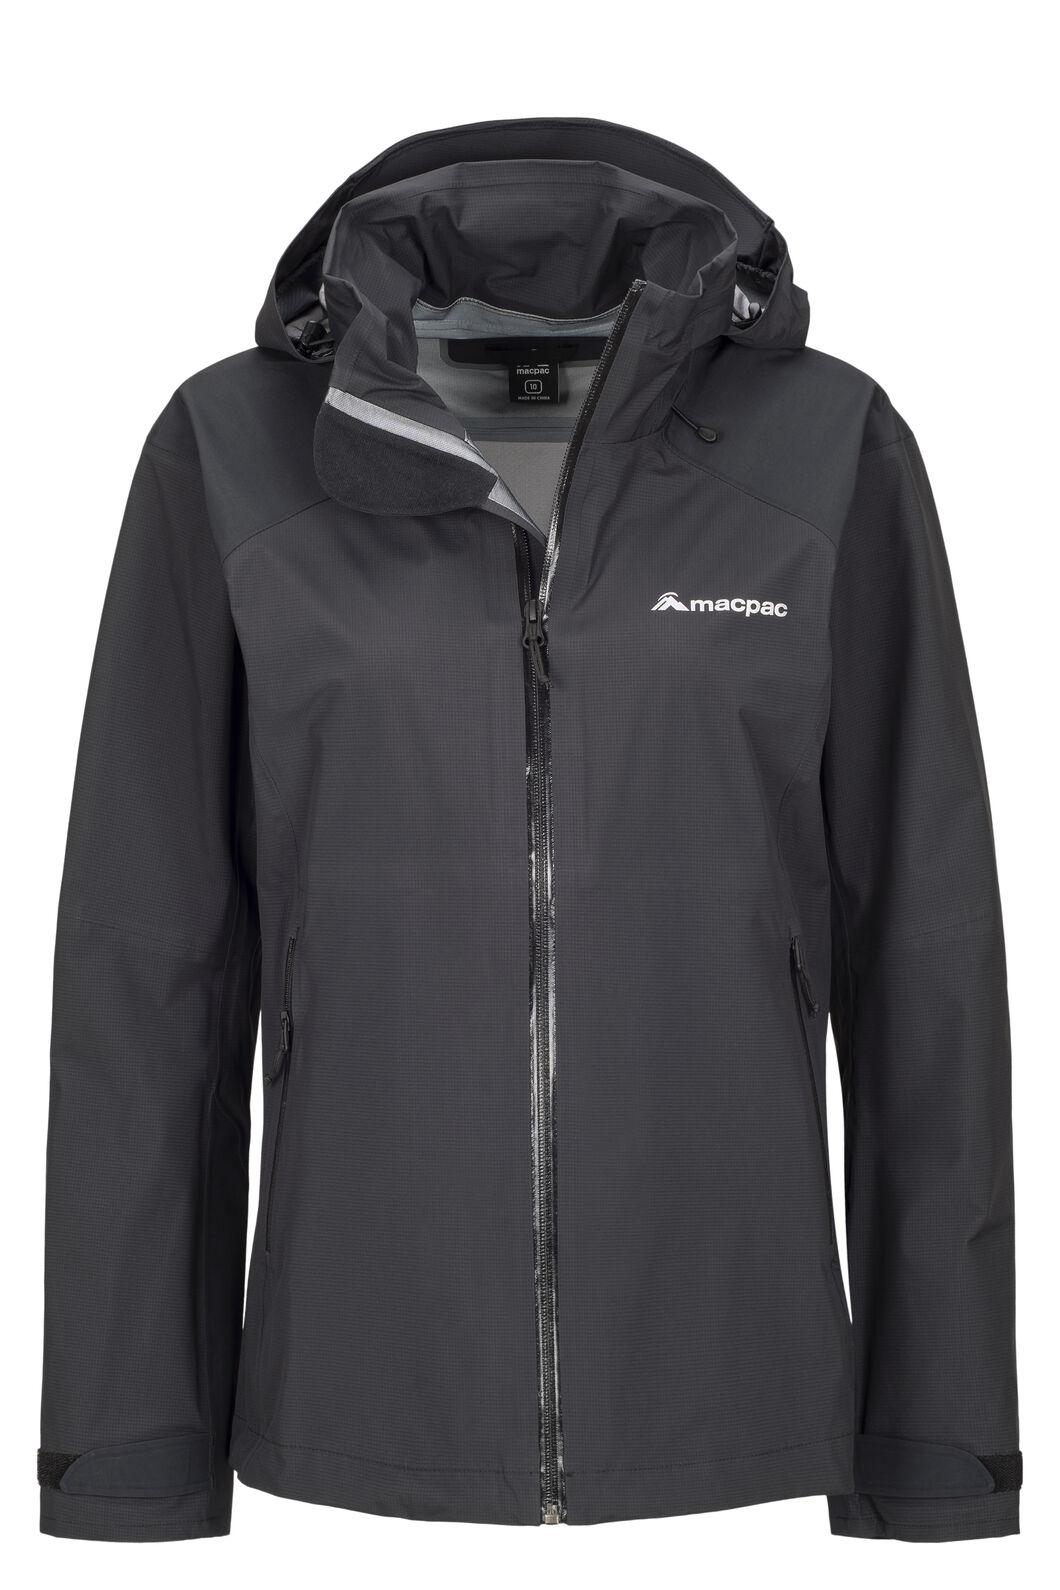 Macpac Women's Traverse Pertex® Rain Jacket, Black, hi-res